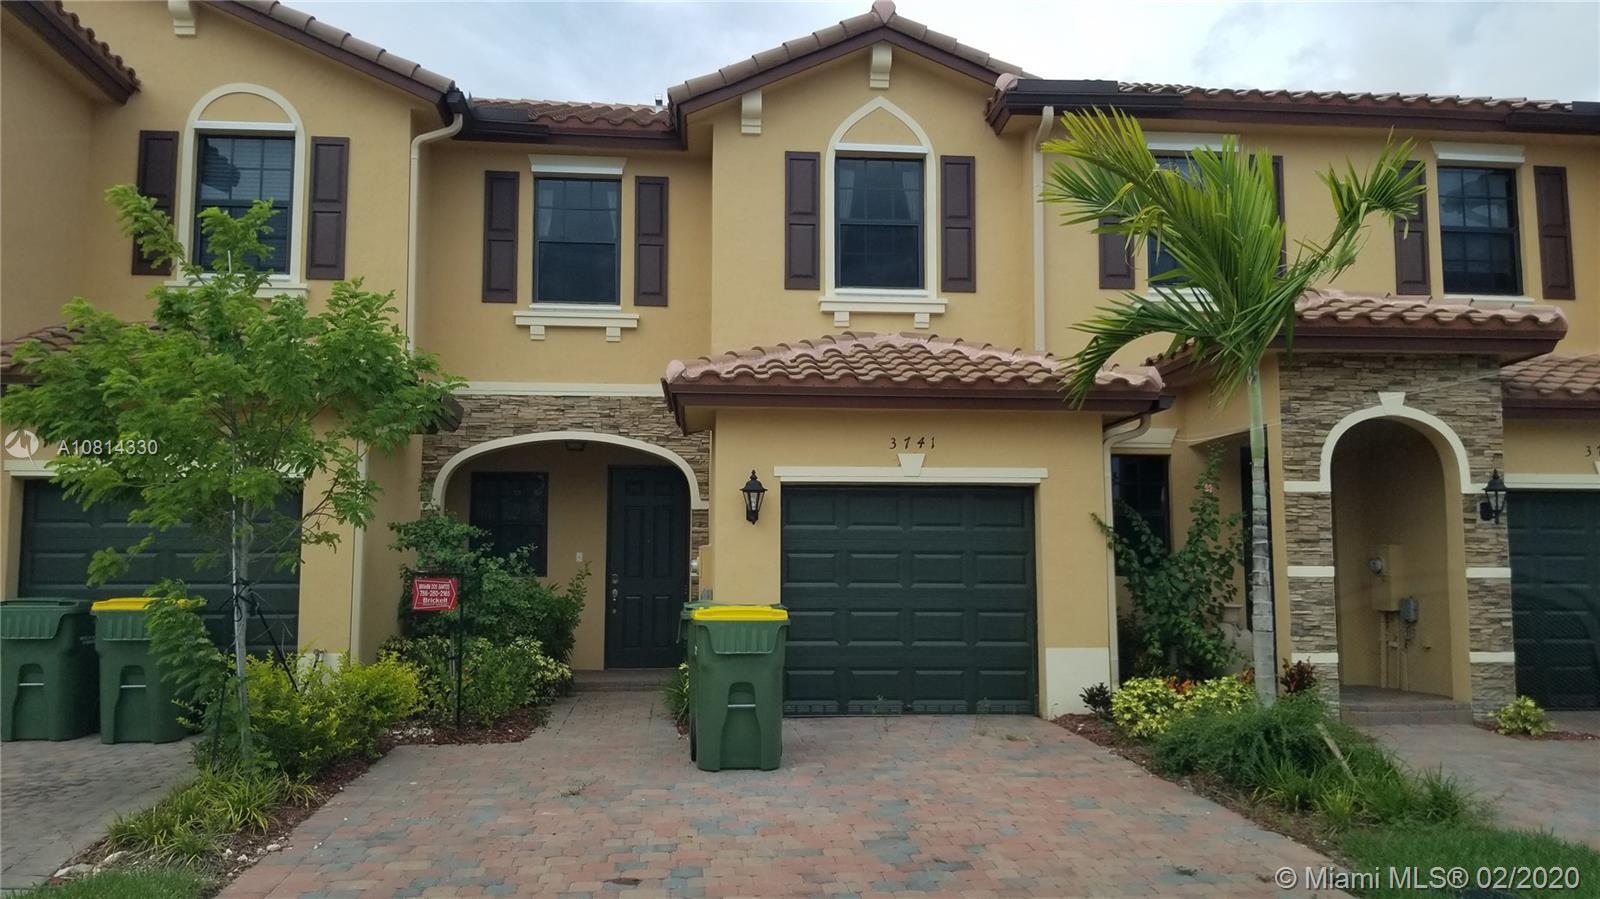 3741 SE 1st St #., Homestead, FL 33033 - Homestead, FL real estate listing